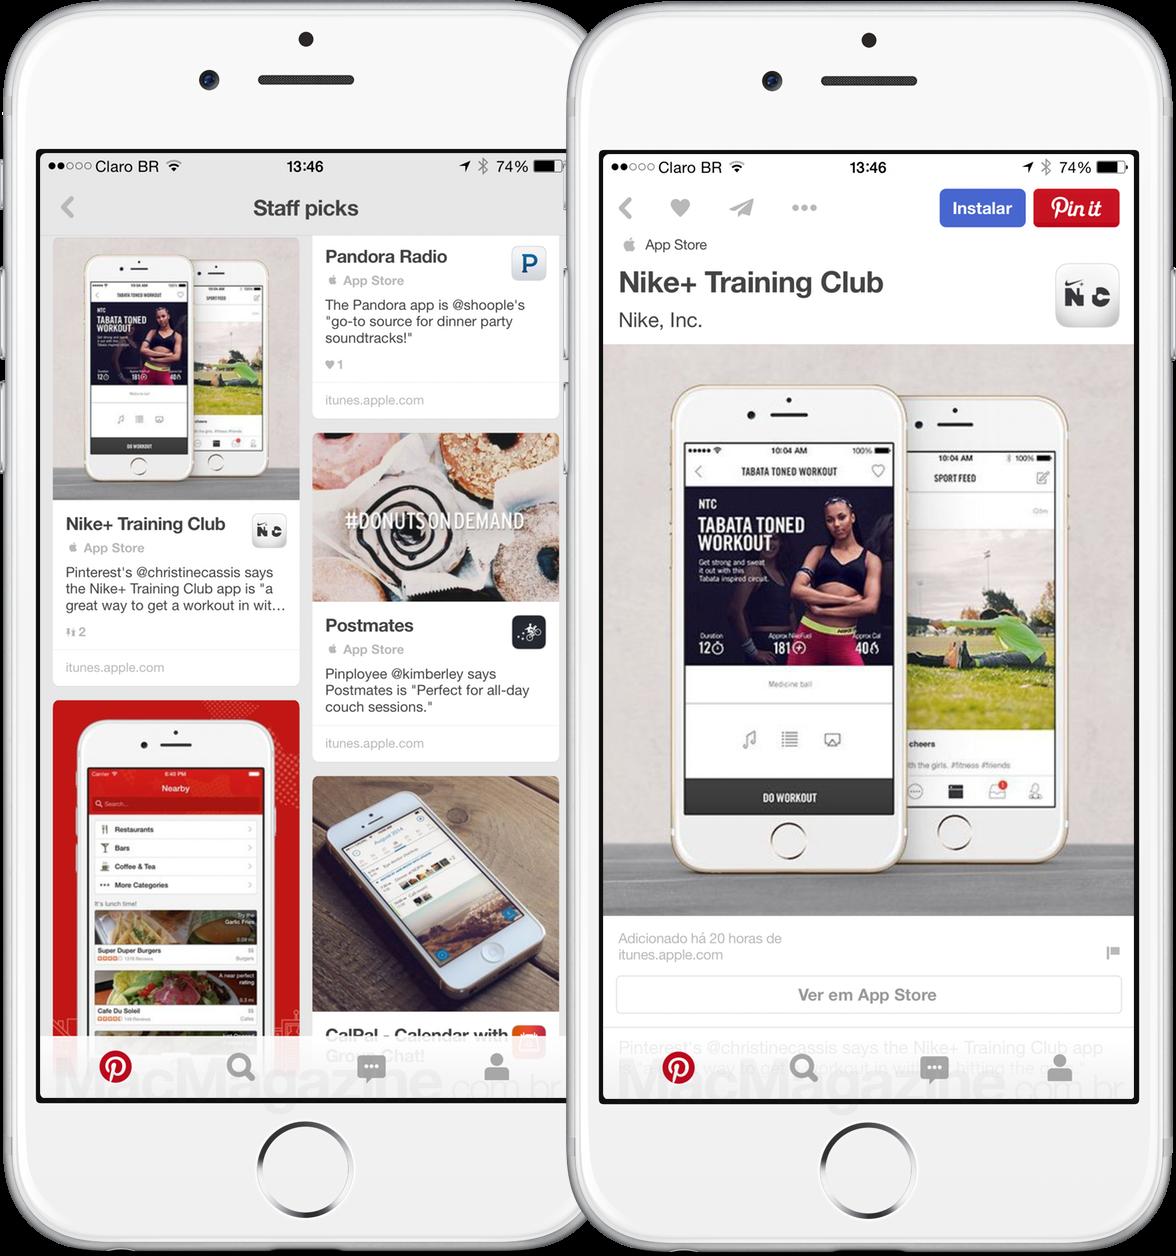 Installing apps from Pinterest